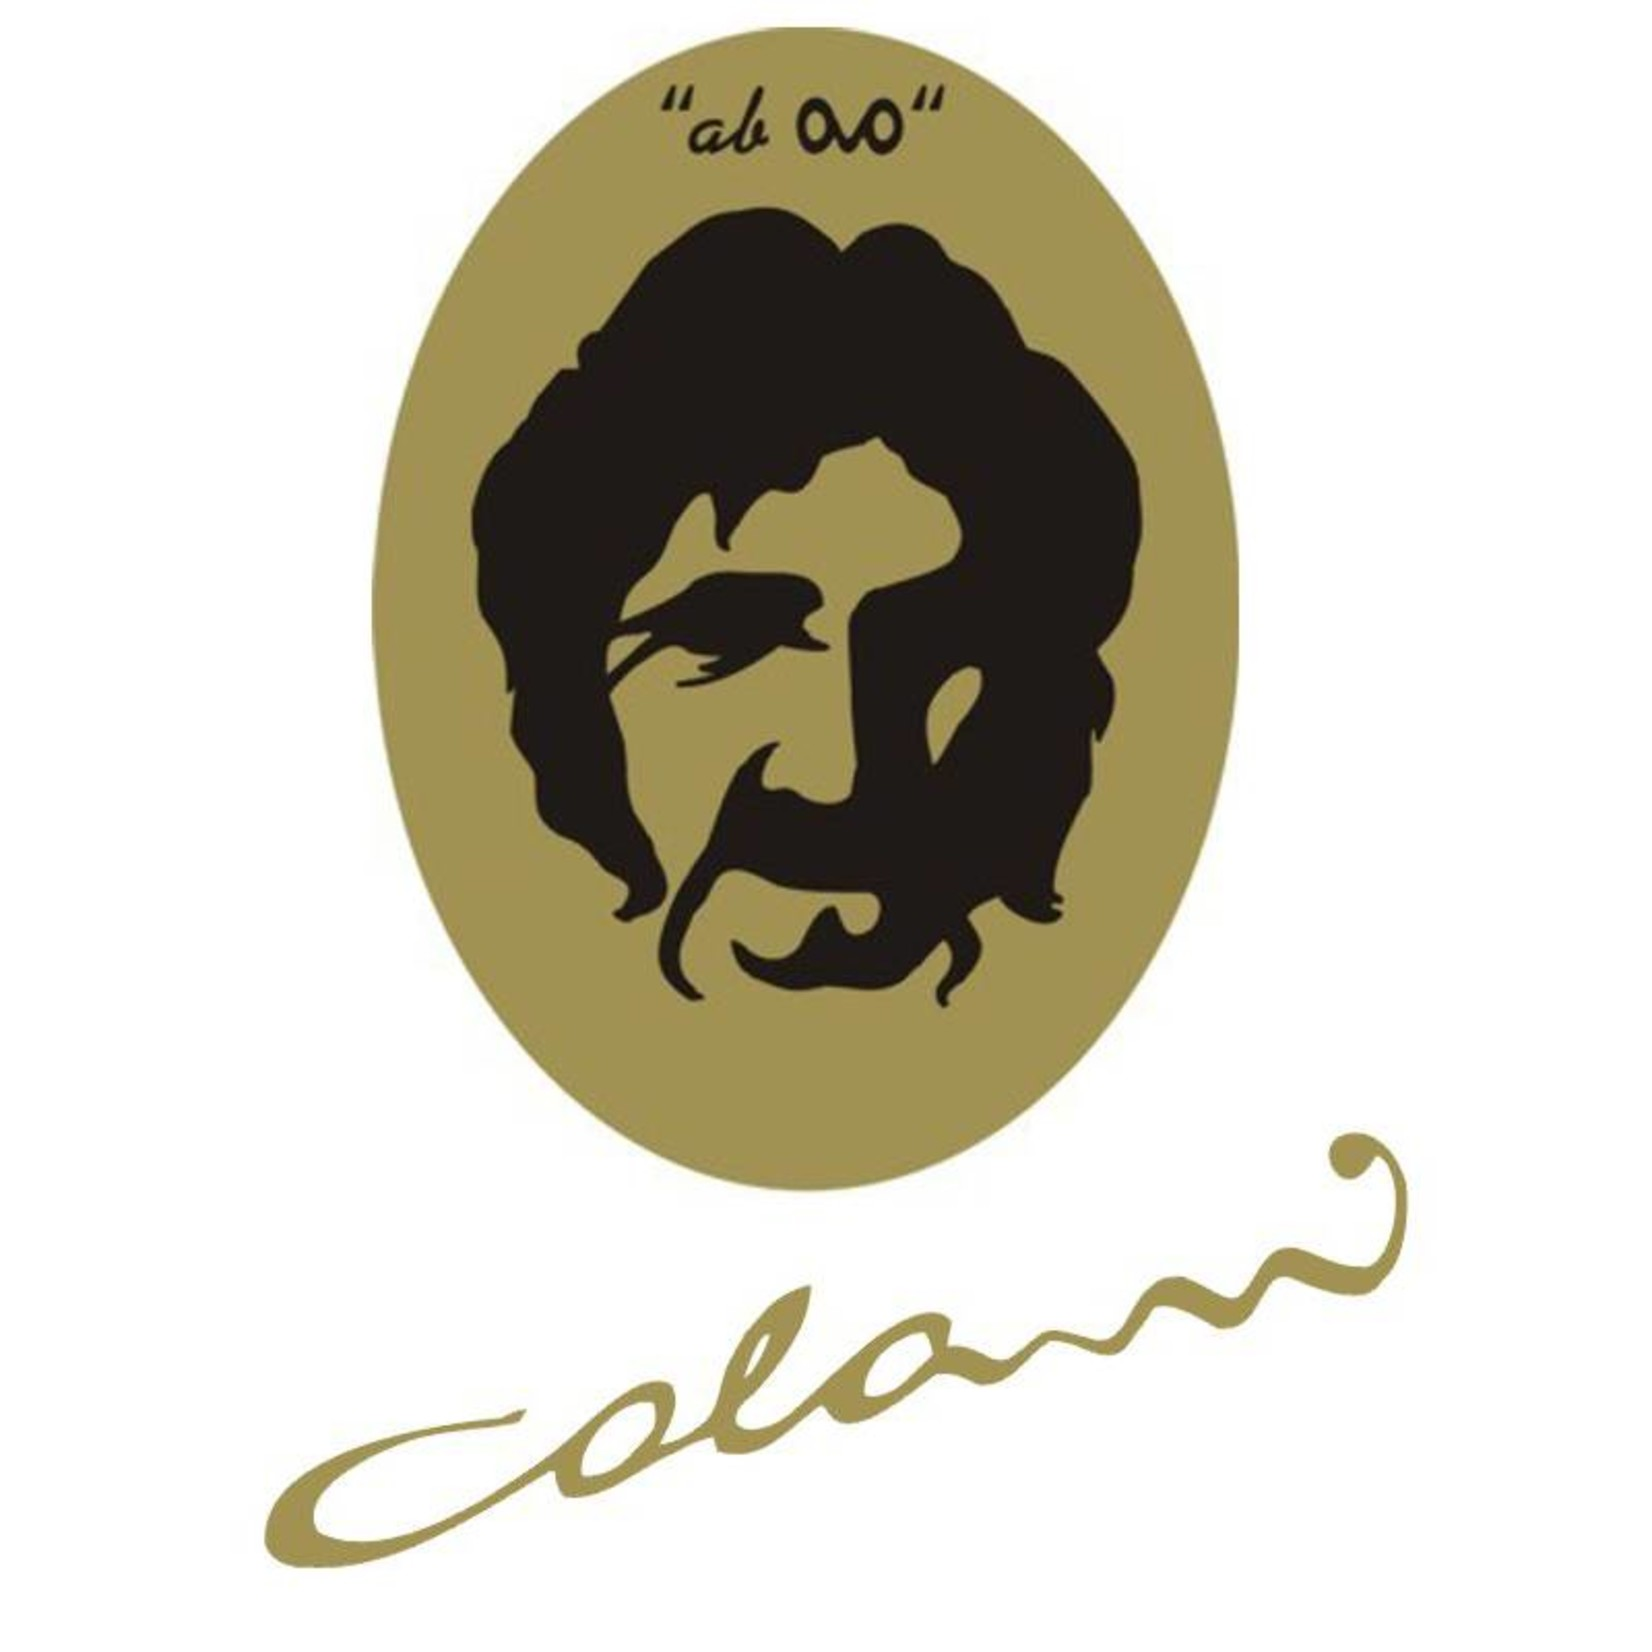 Colani Porzellanserie Luigi Colani Kaffeebecher aus Porzellan in Grün